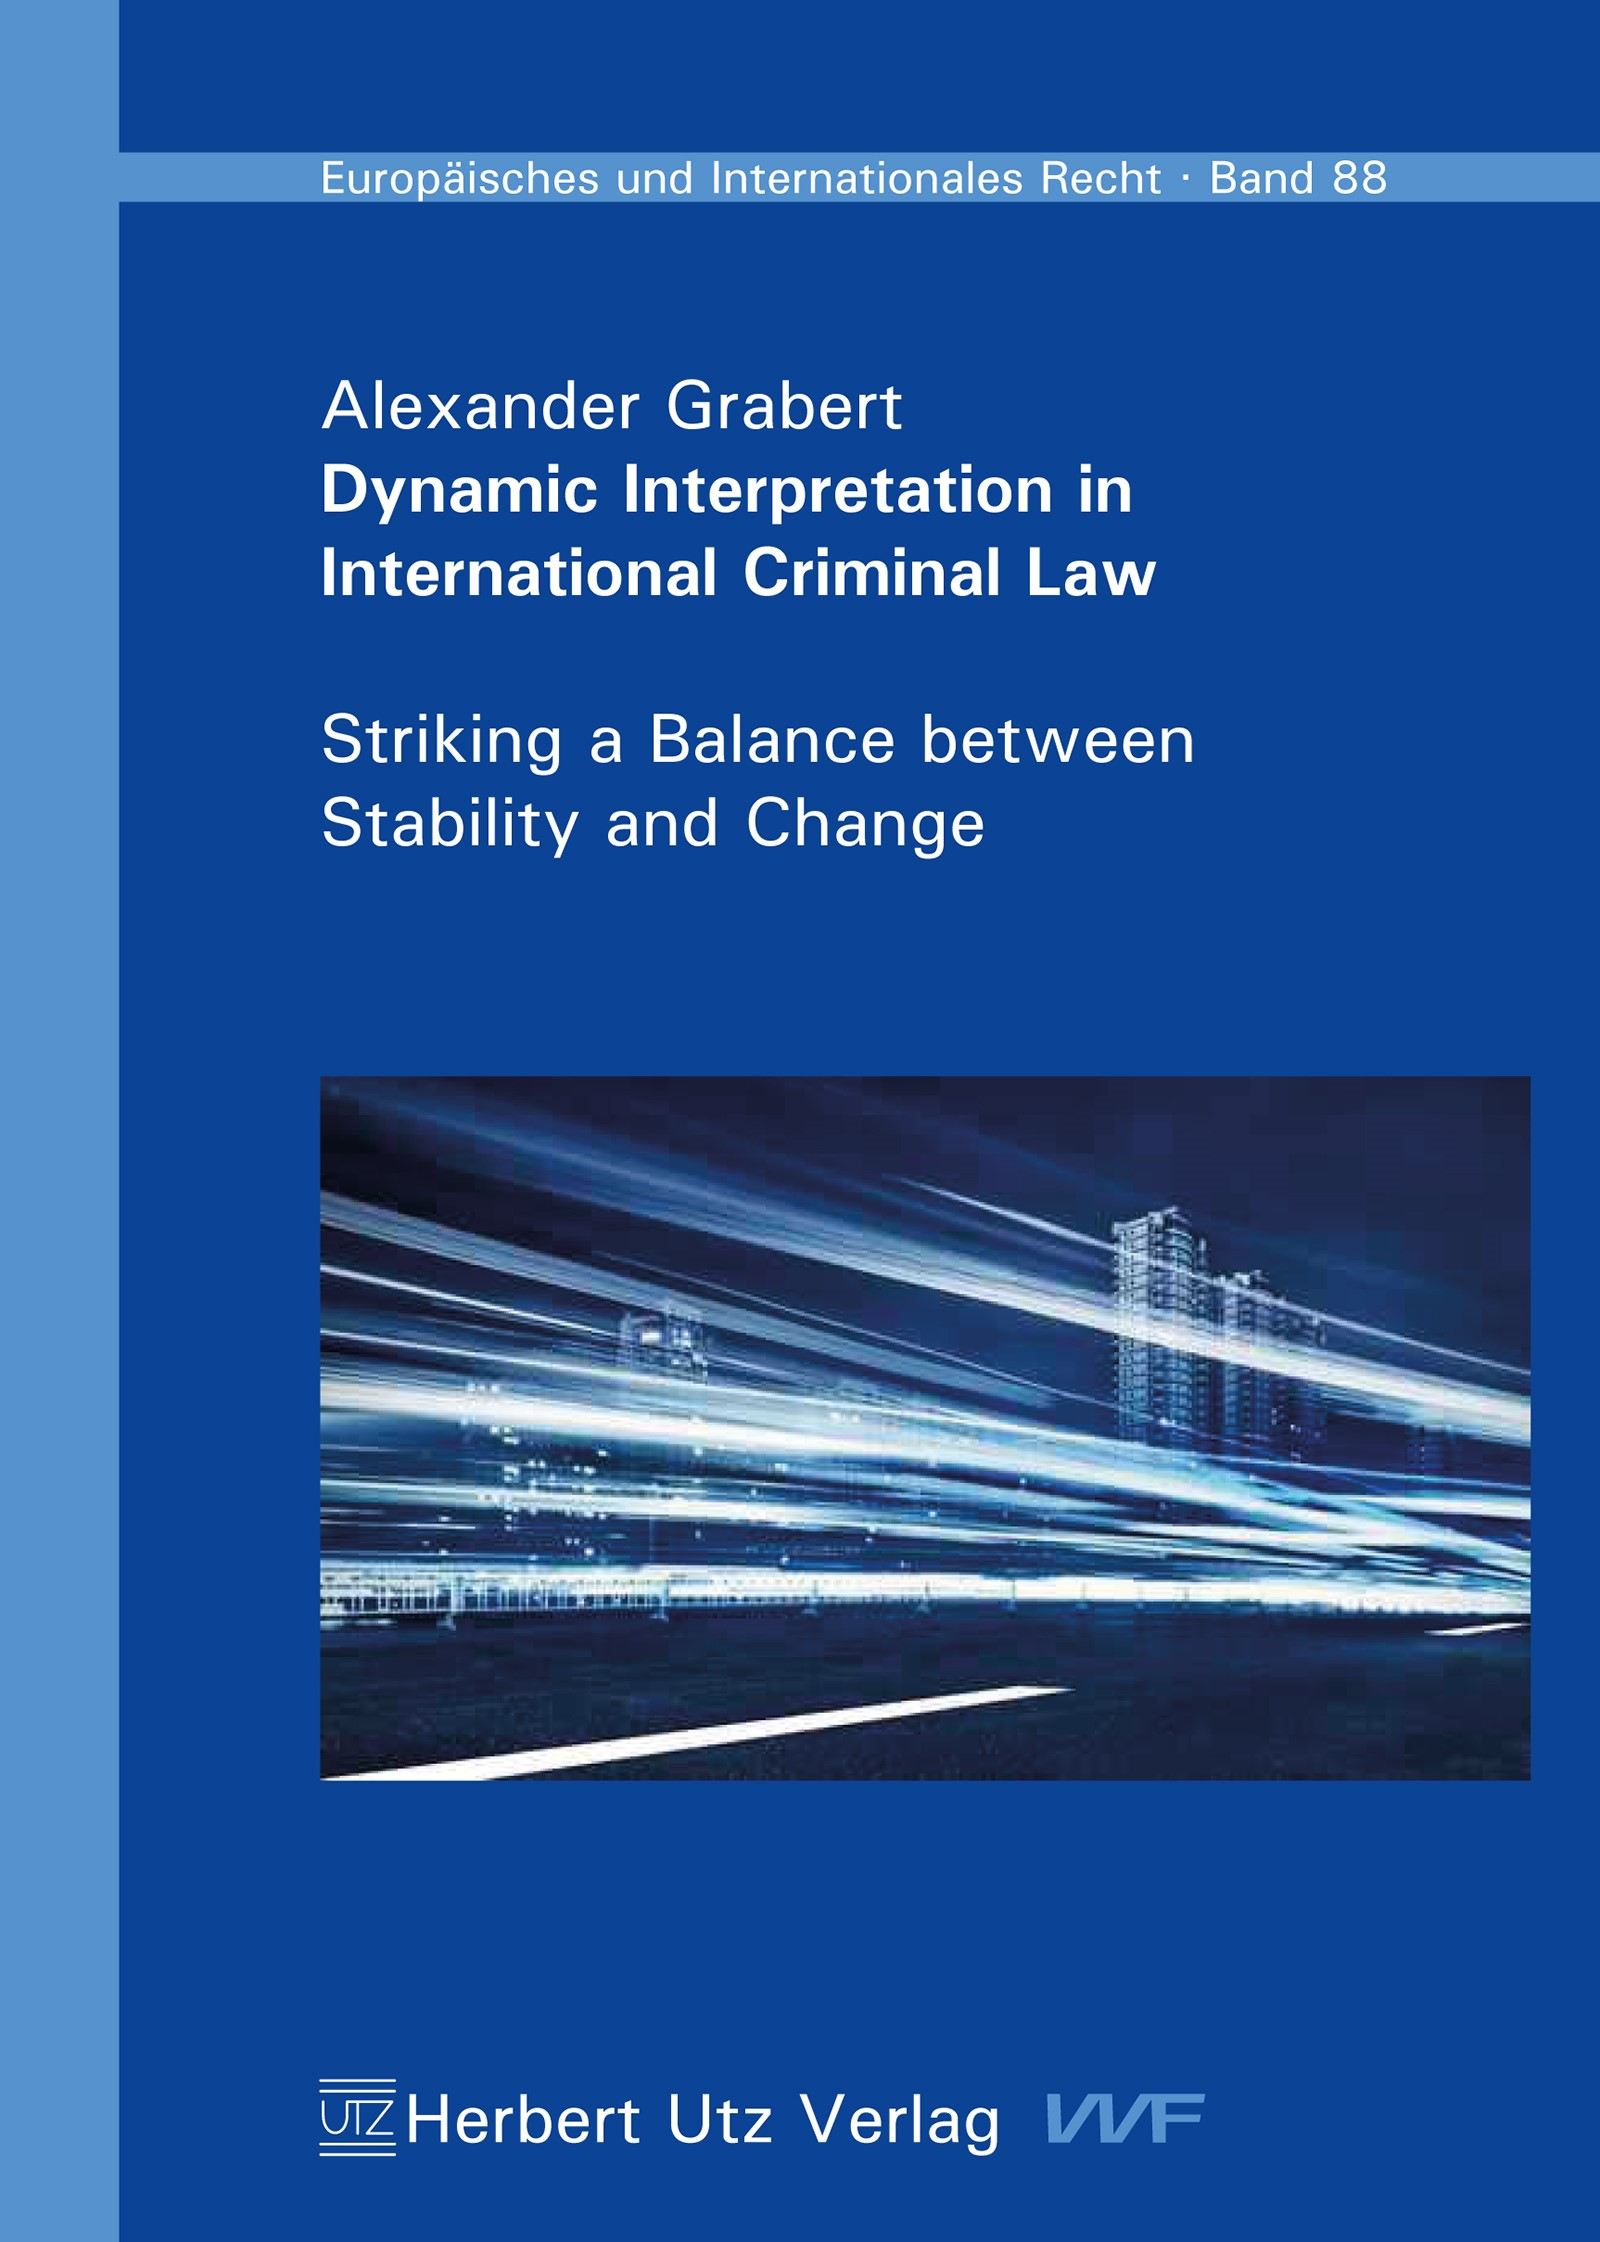 Dynamic Interpretation in International Criminal Law | Grabert, 2015 (Cover)